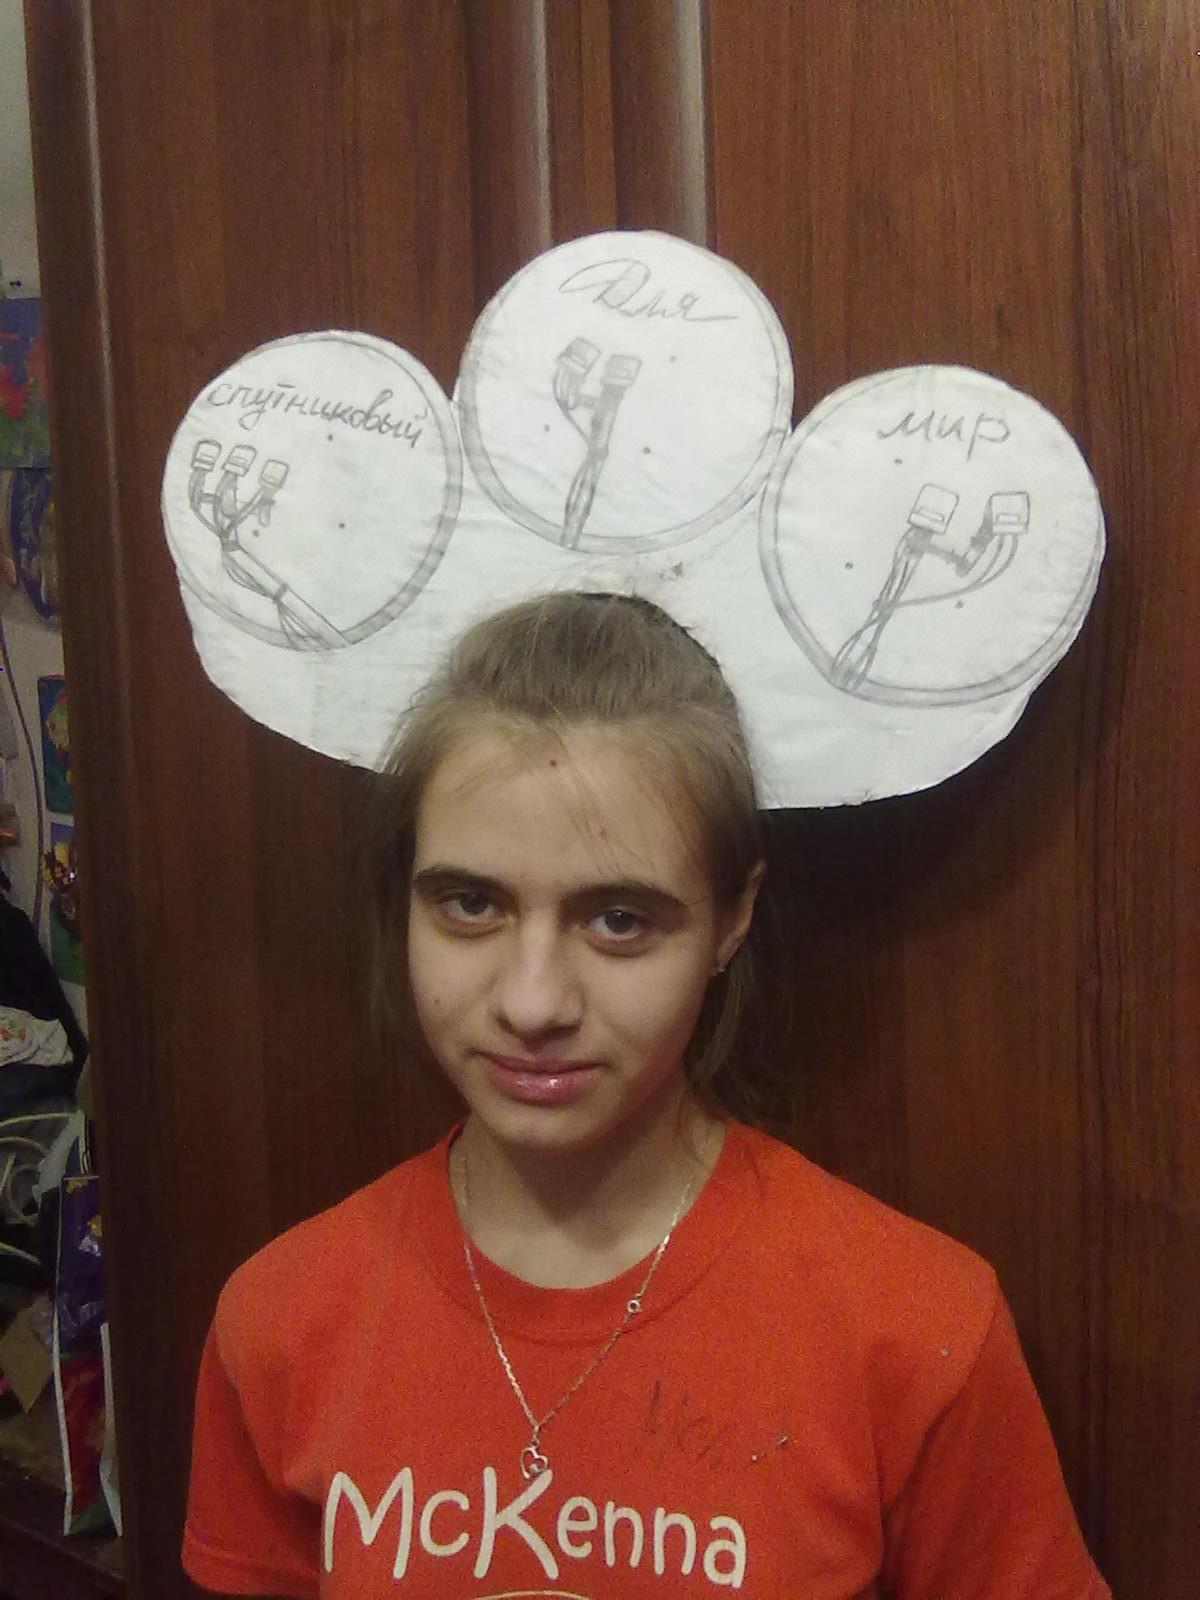 На конкурс кокошников. Дочка рисовала и позировала.